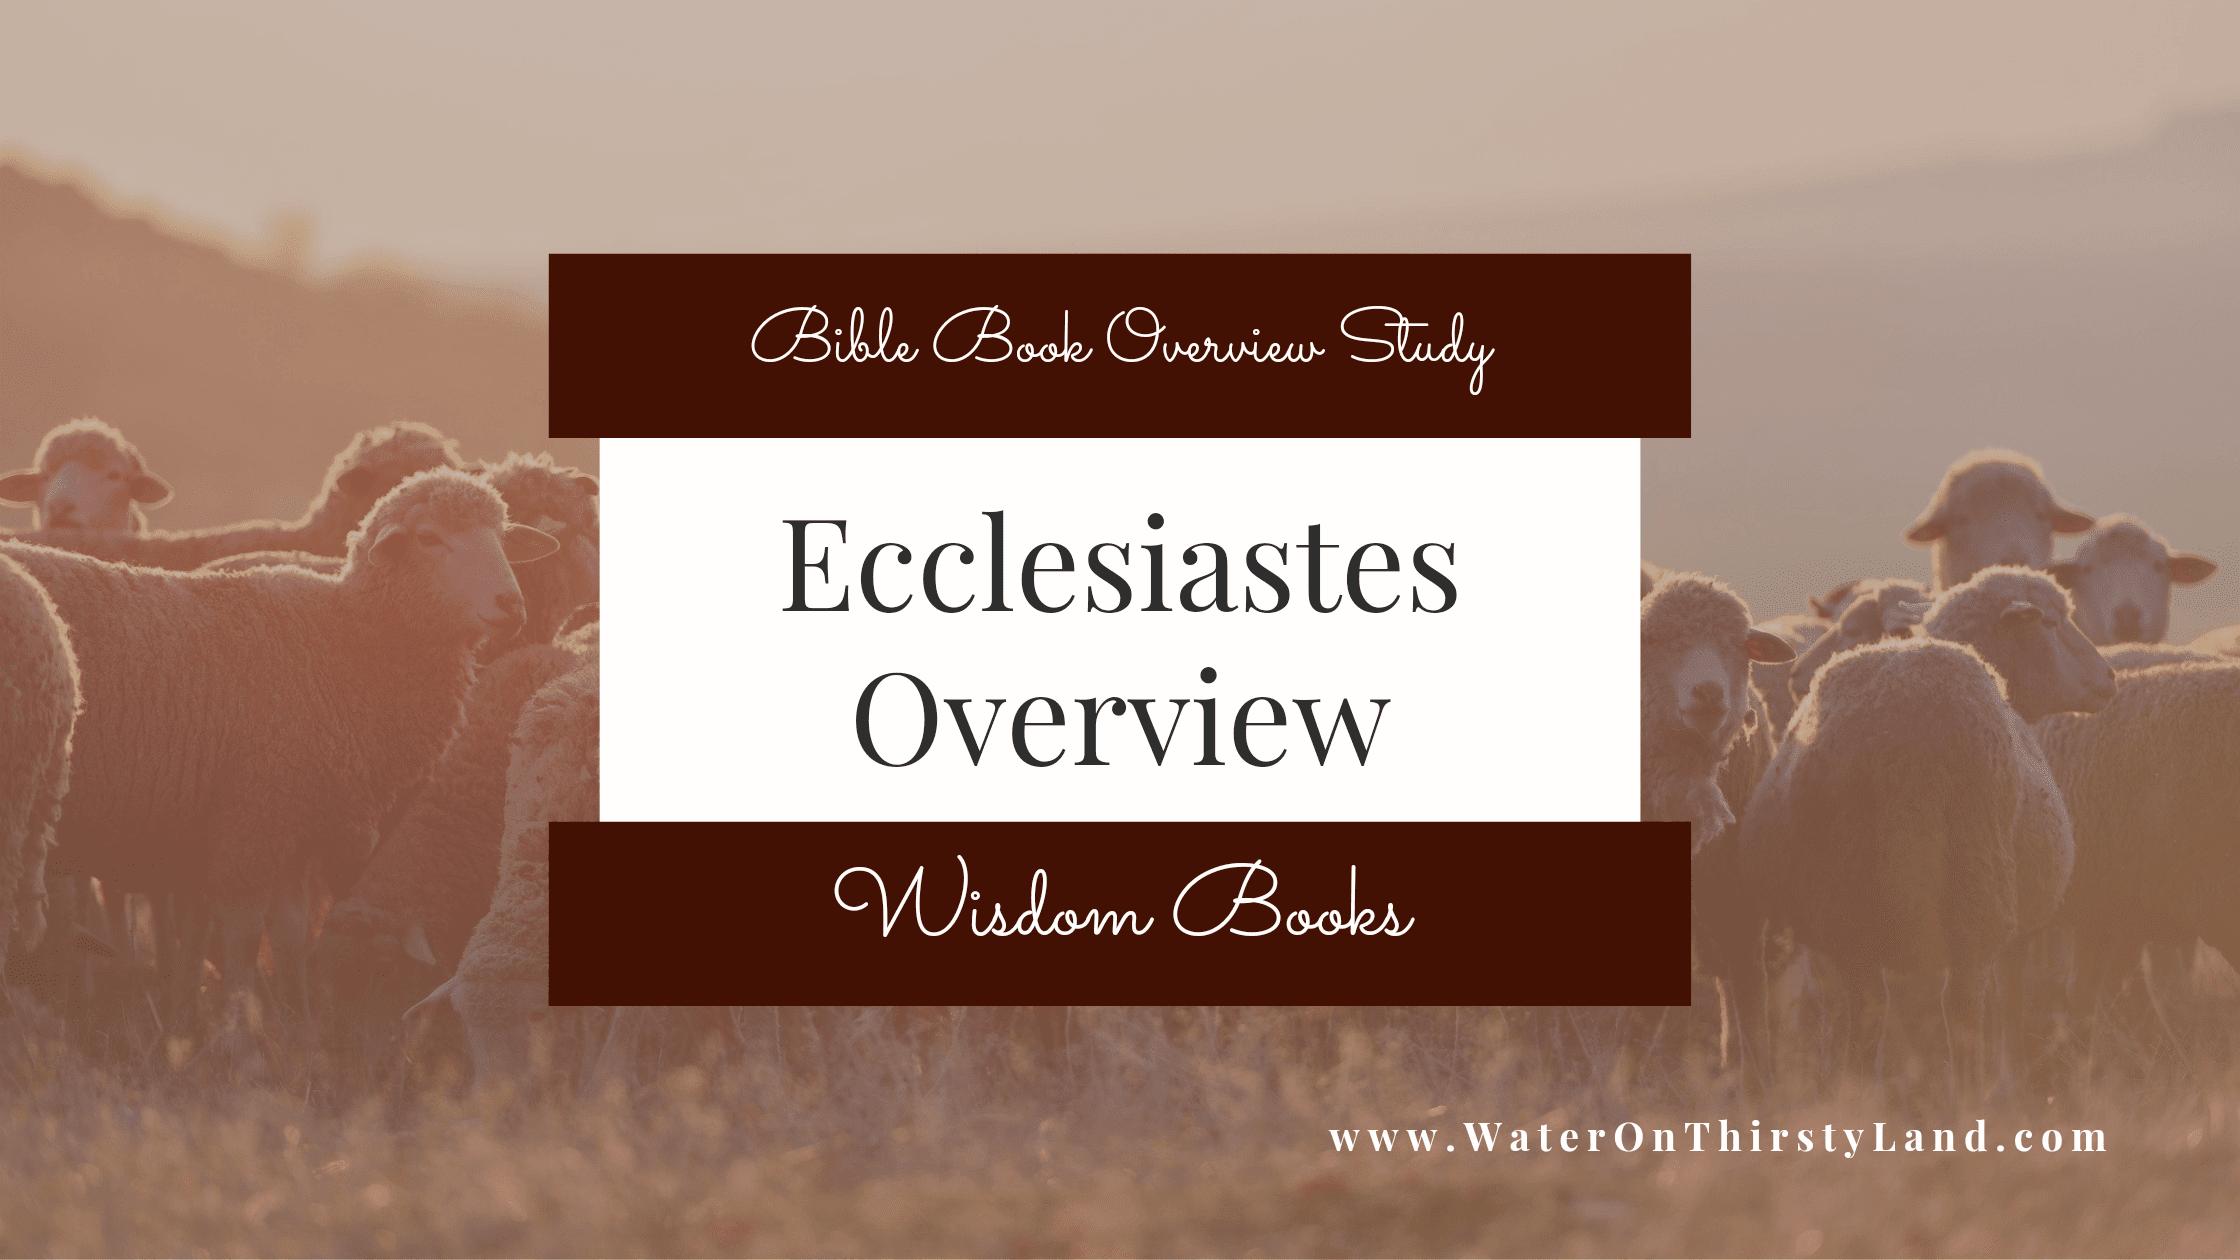 Ecclesiastes Overview